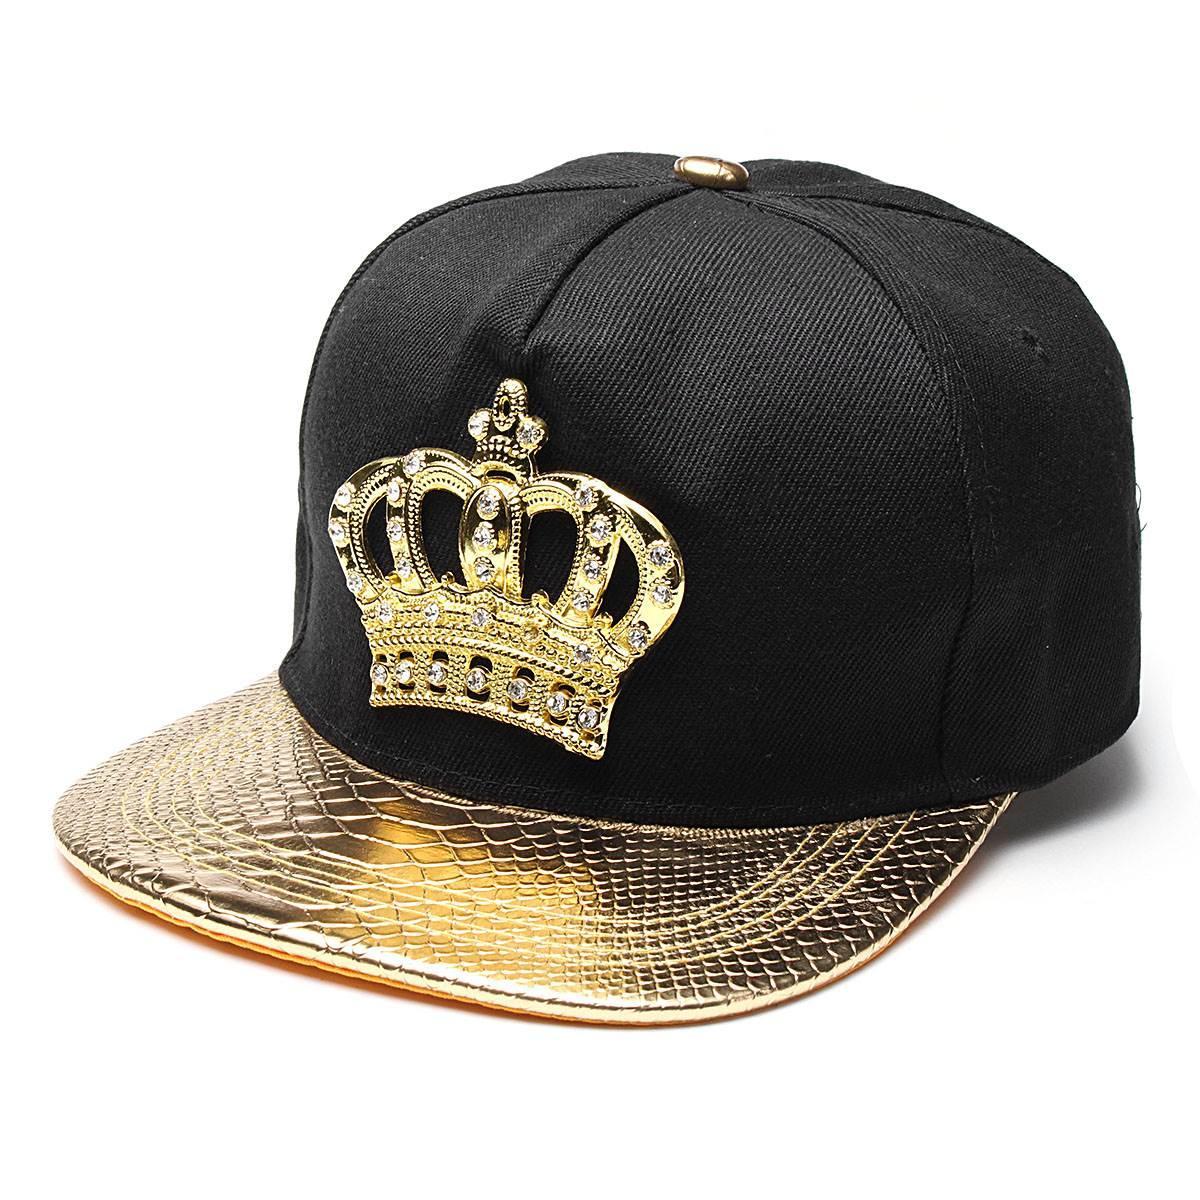 11d8e2b934a Mens Womens Snapback Hat KING Crown Baseball Caps Adjustable Hip Hop Hats  Black Summer Peaked Rhinestone Crystal Sun Cap Baseball Hats Newsboy Cap  From Wdrf ...